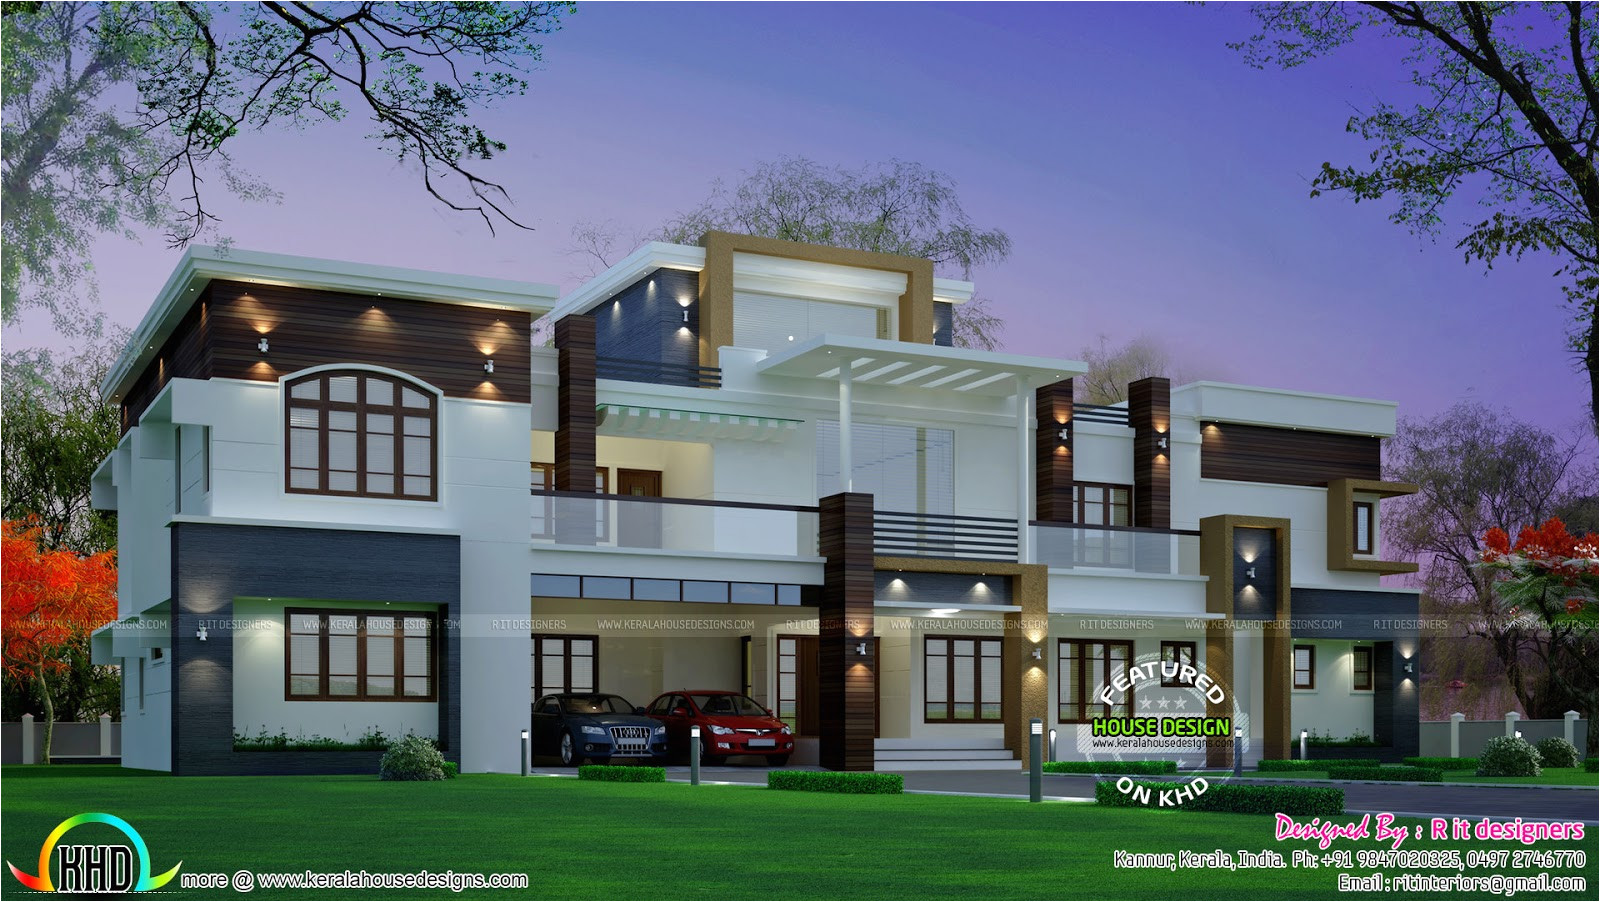 western design homes